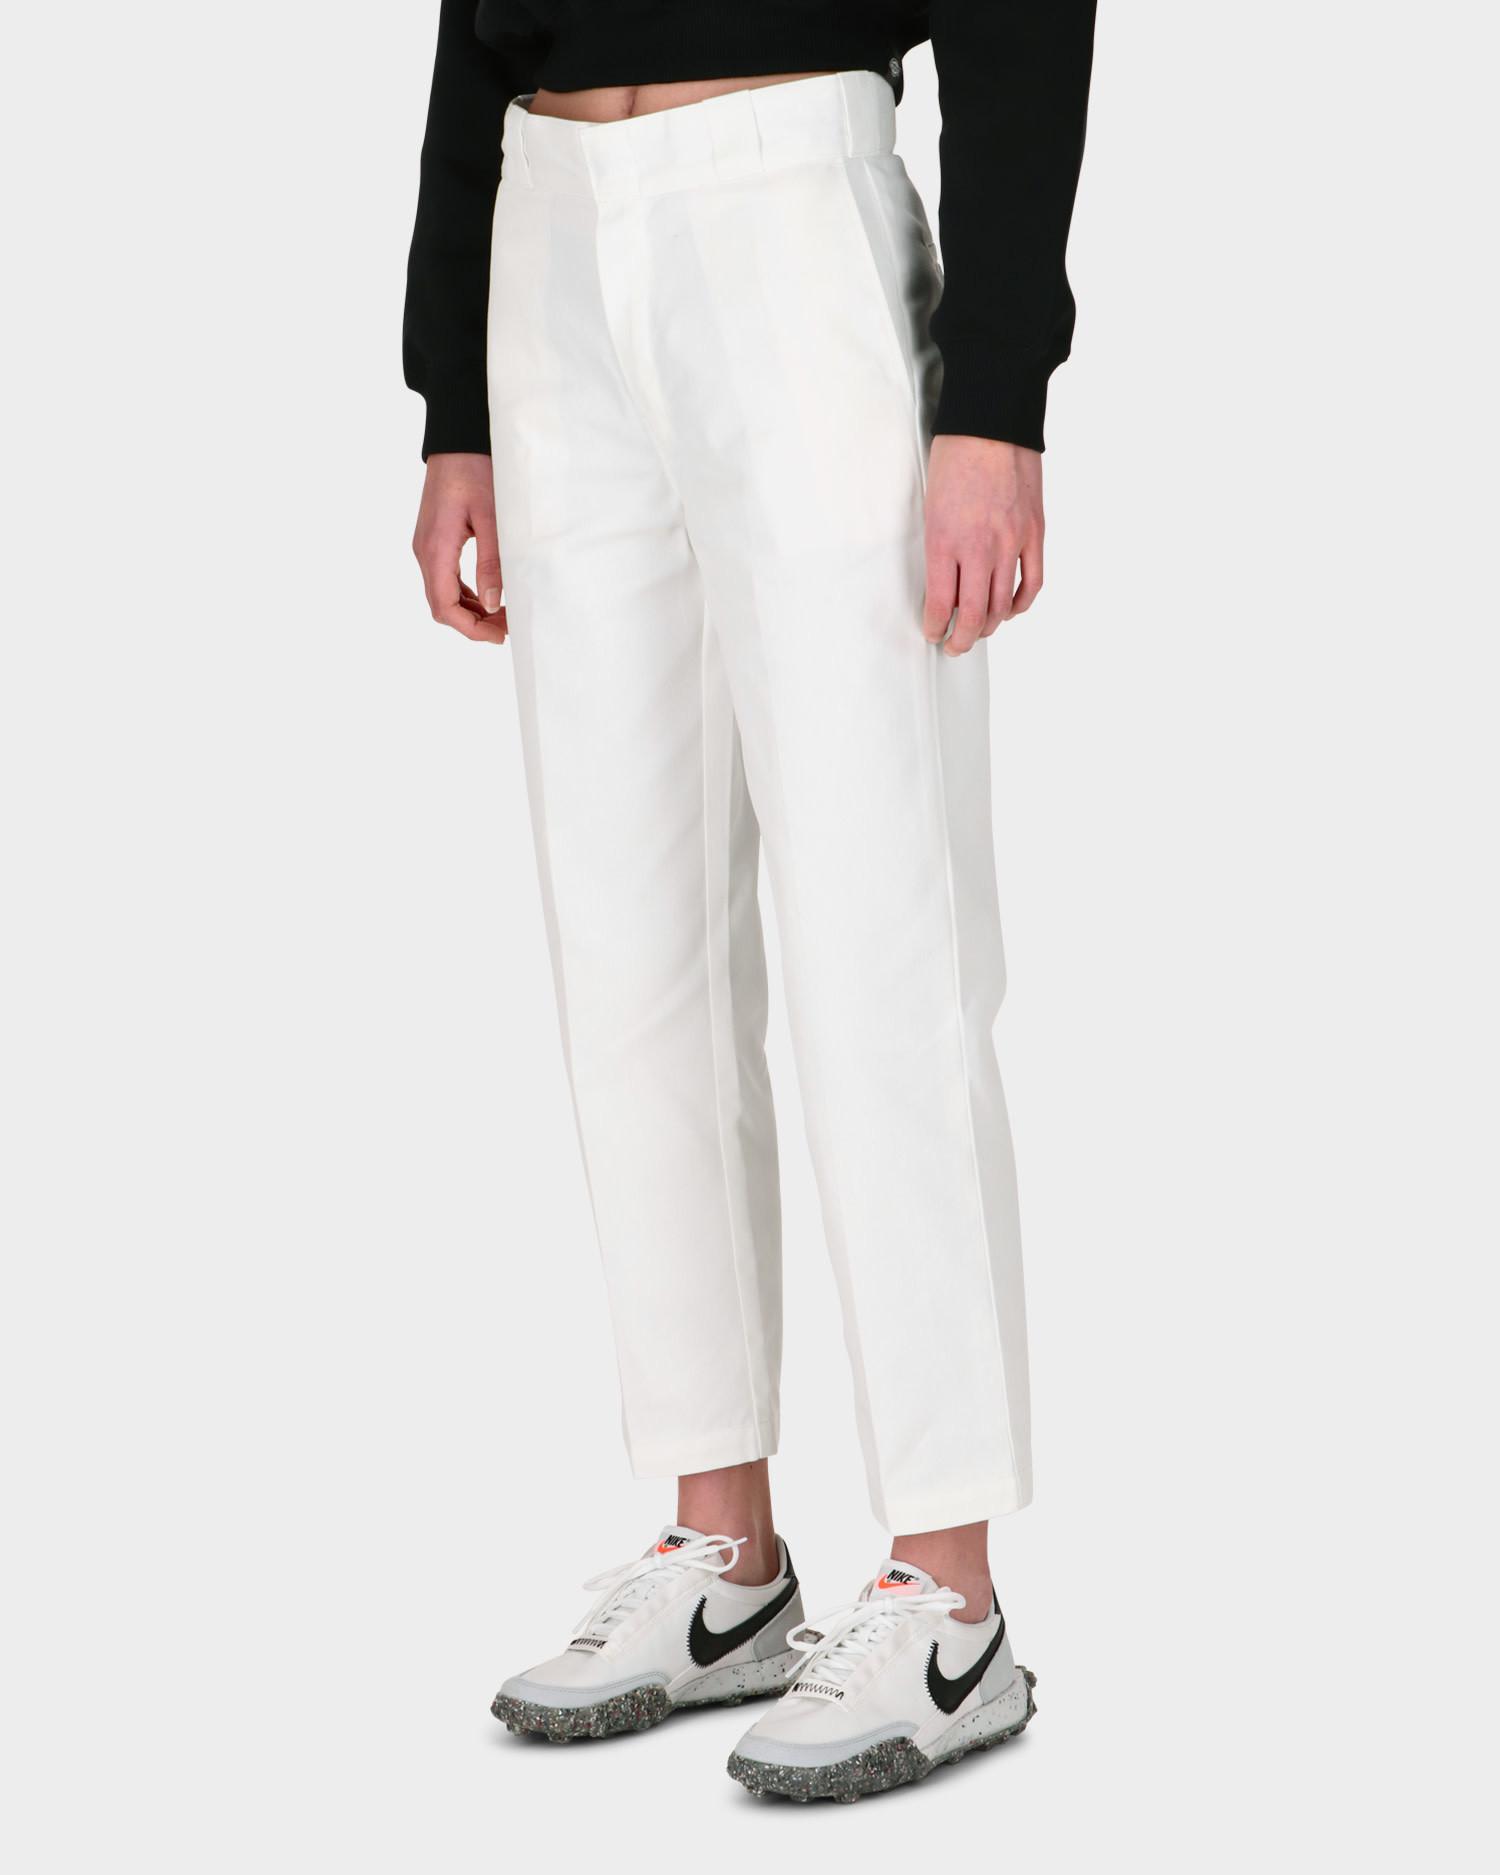 Dickies Original 874 W Cropped Pant White